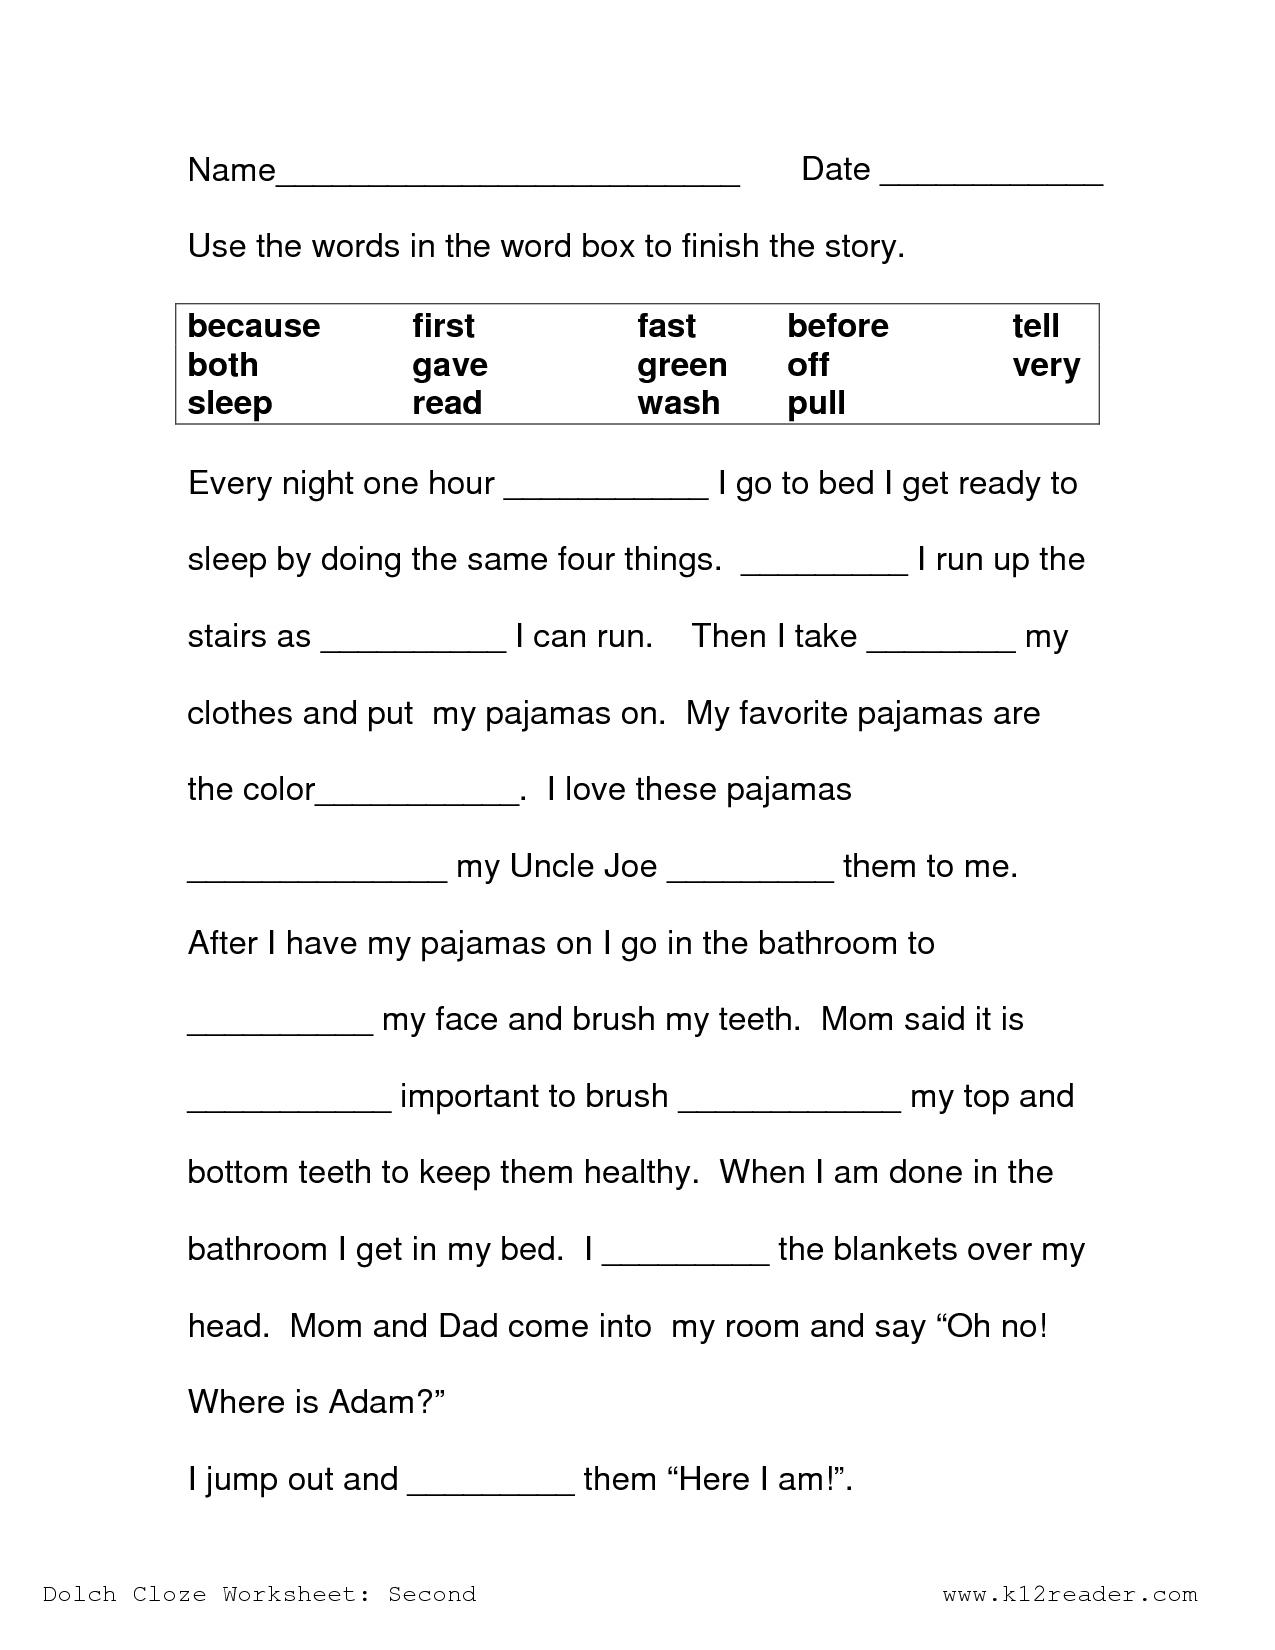 Free Printable Reading Comprehension Worksheets 3Rd Grade To Print | Printable Reading Comprehension Worksheets